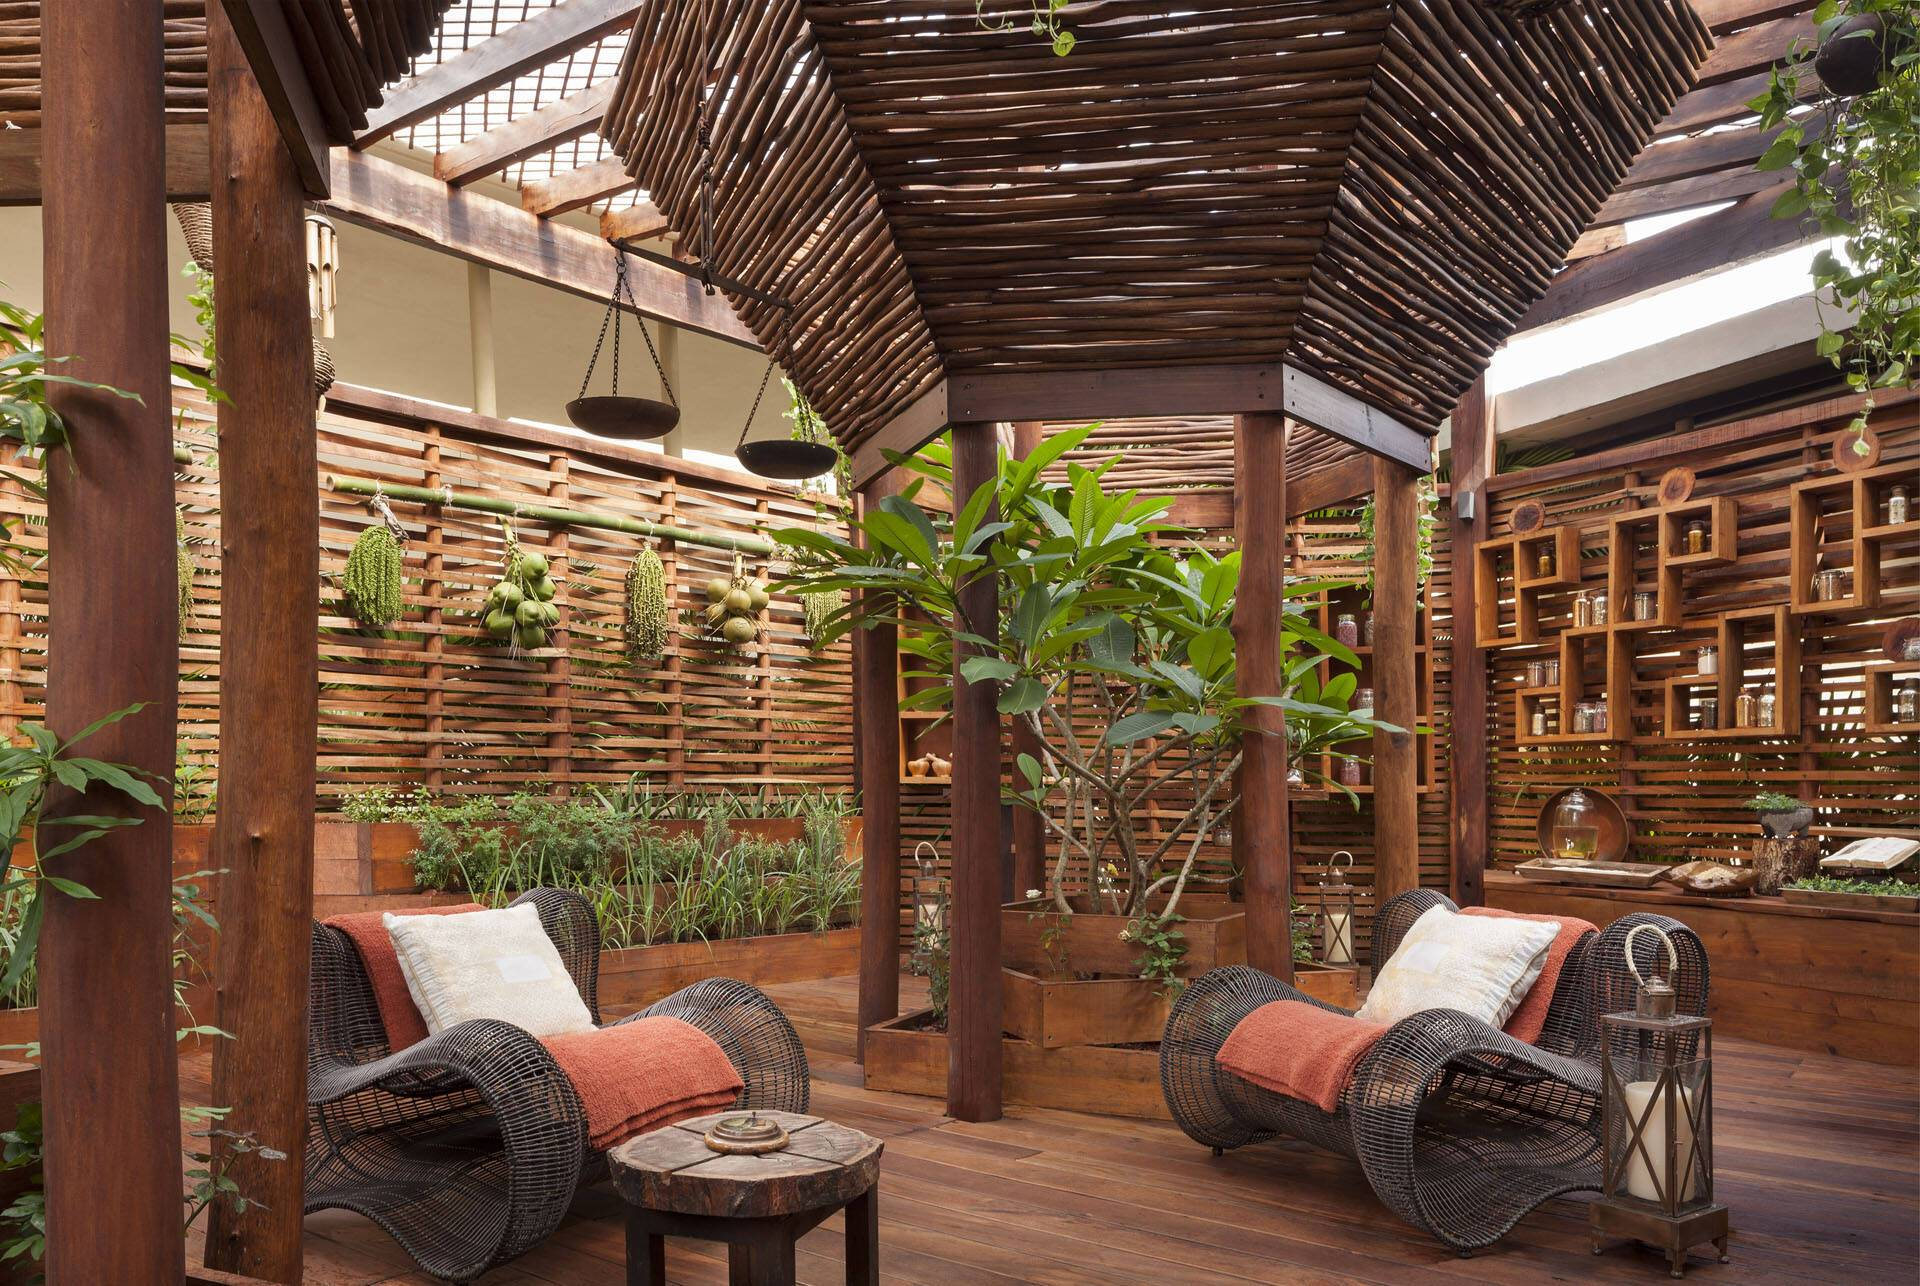 Rosewood Mayakoba Mexique SenseSpa Kuxtal Sensory Garden